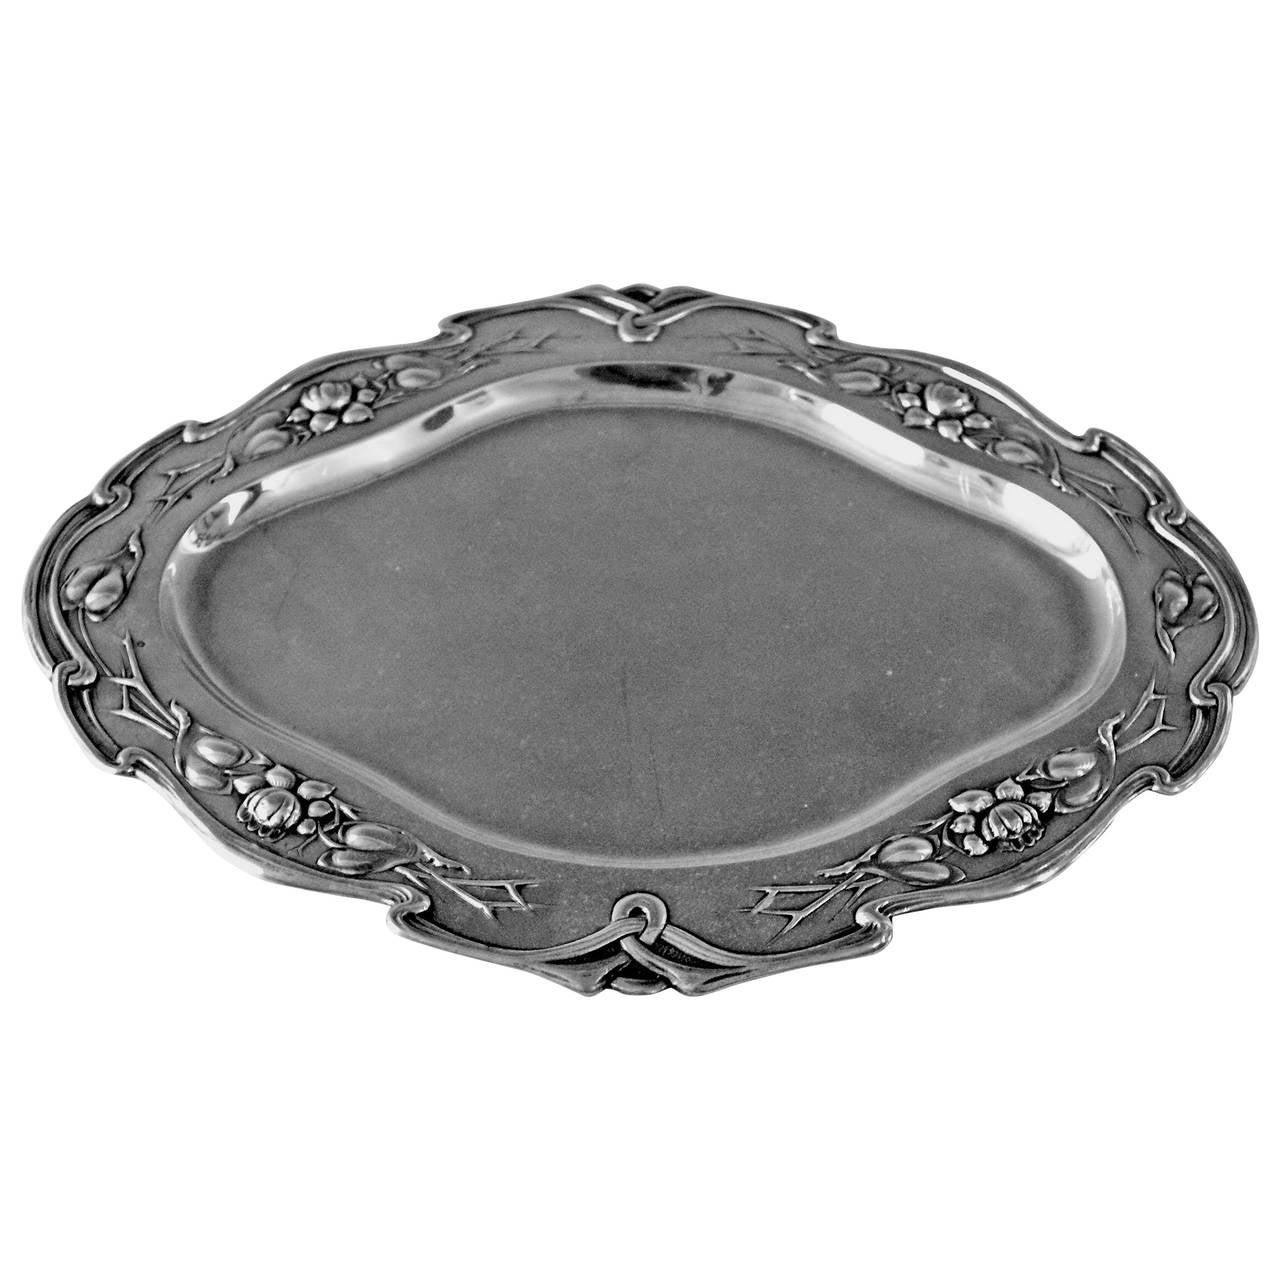 Silver Austrian Excellent Serving Platter, circa 1905 For Sale